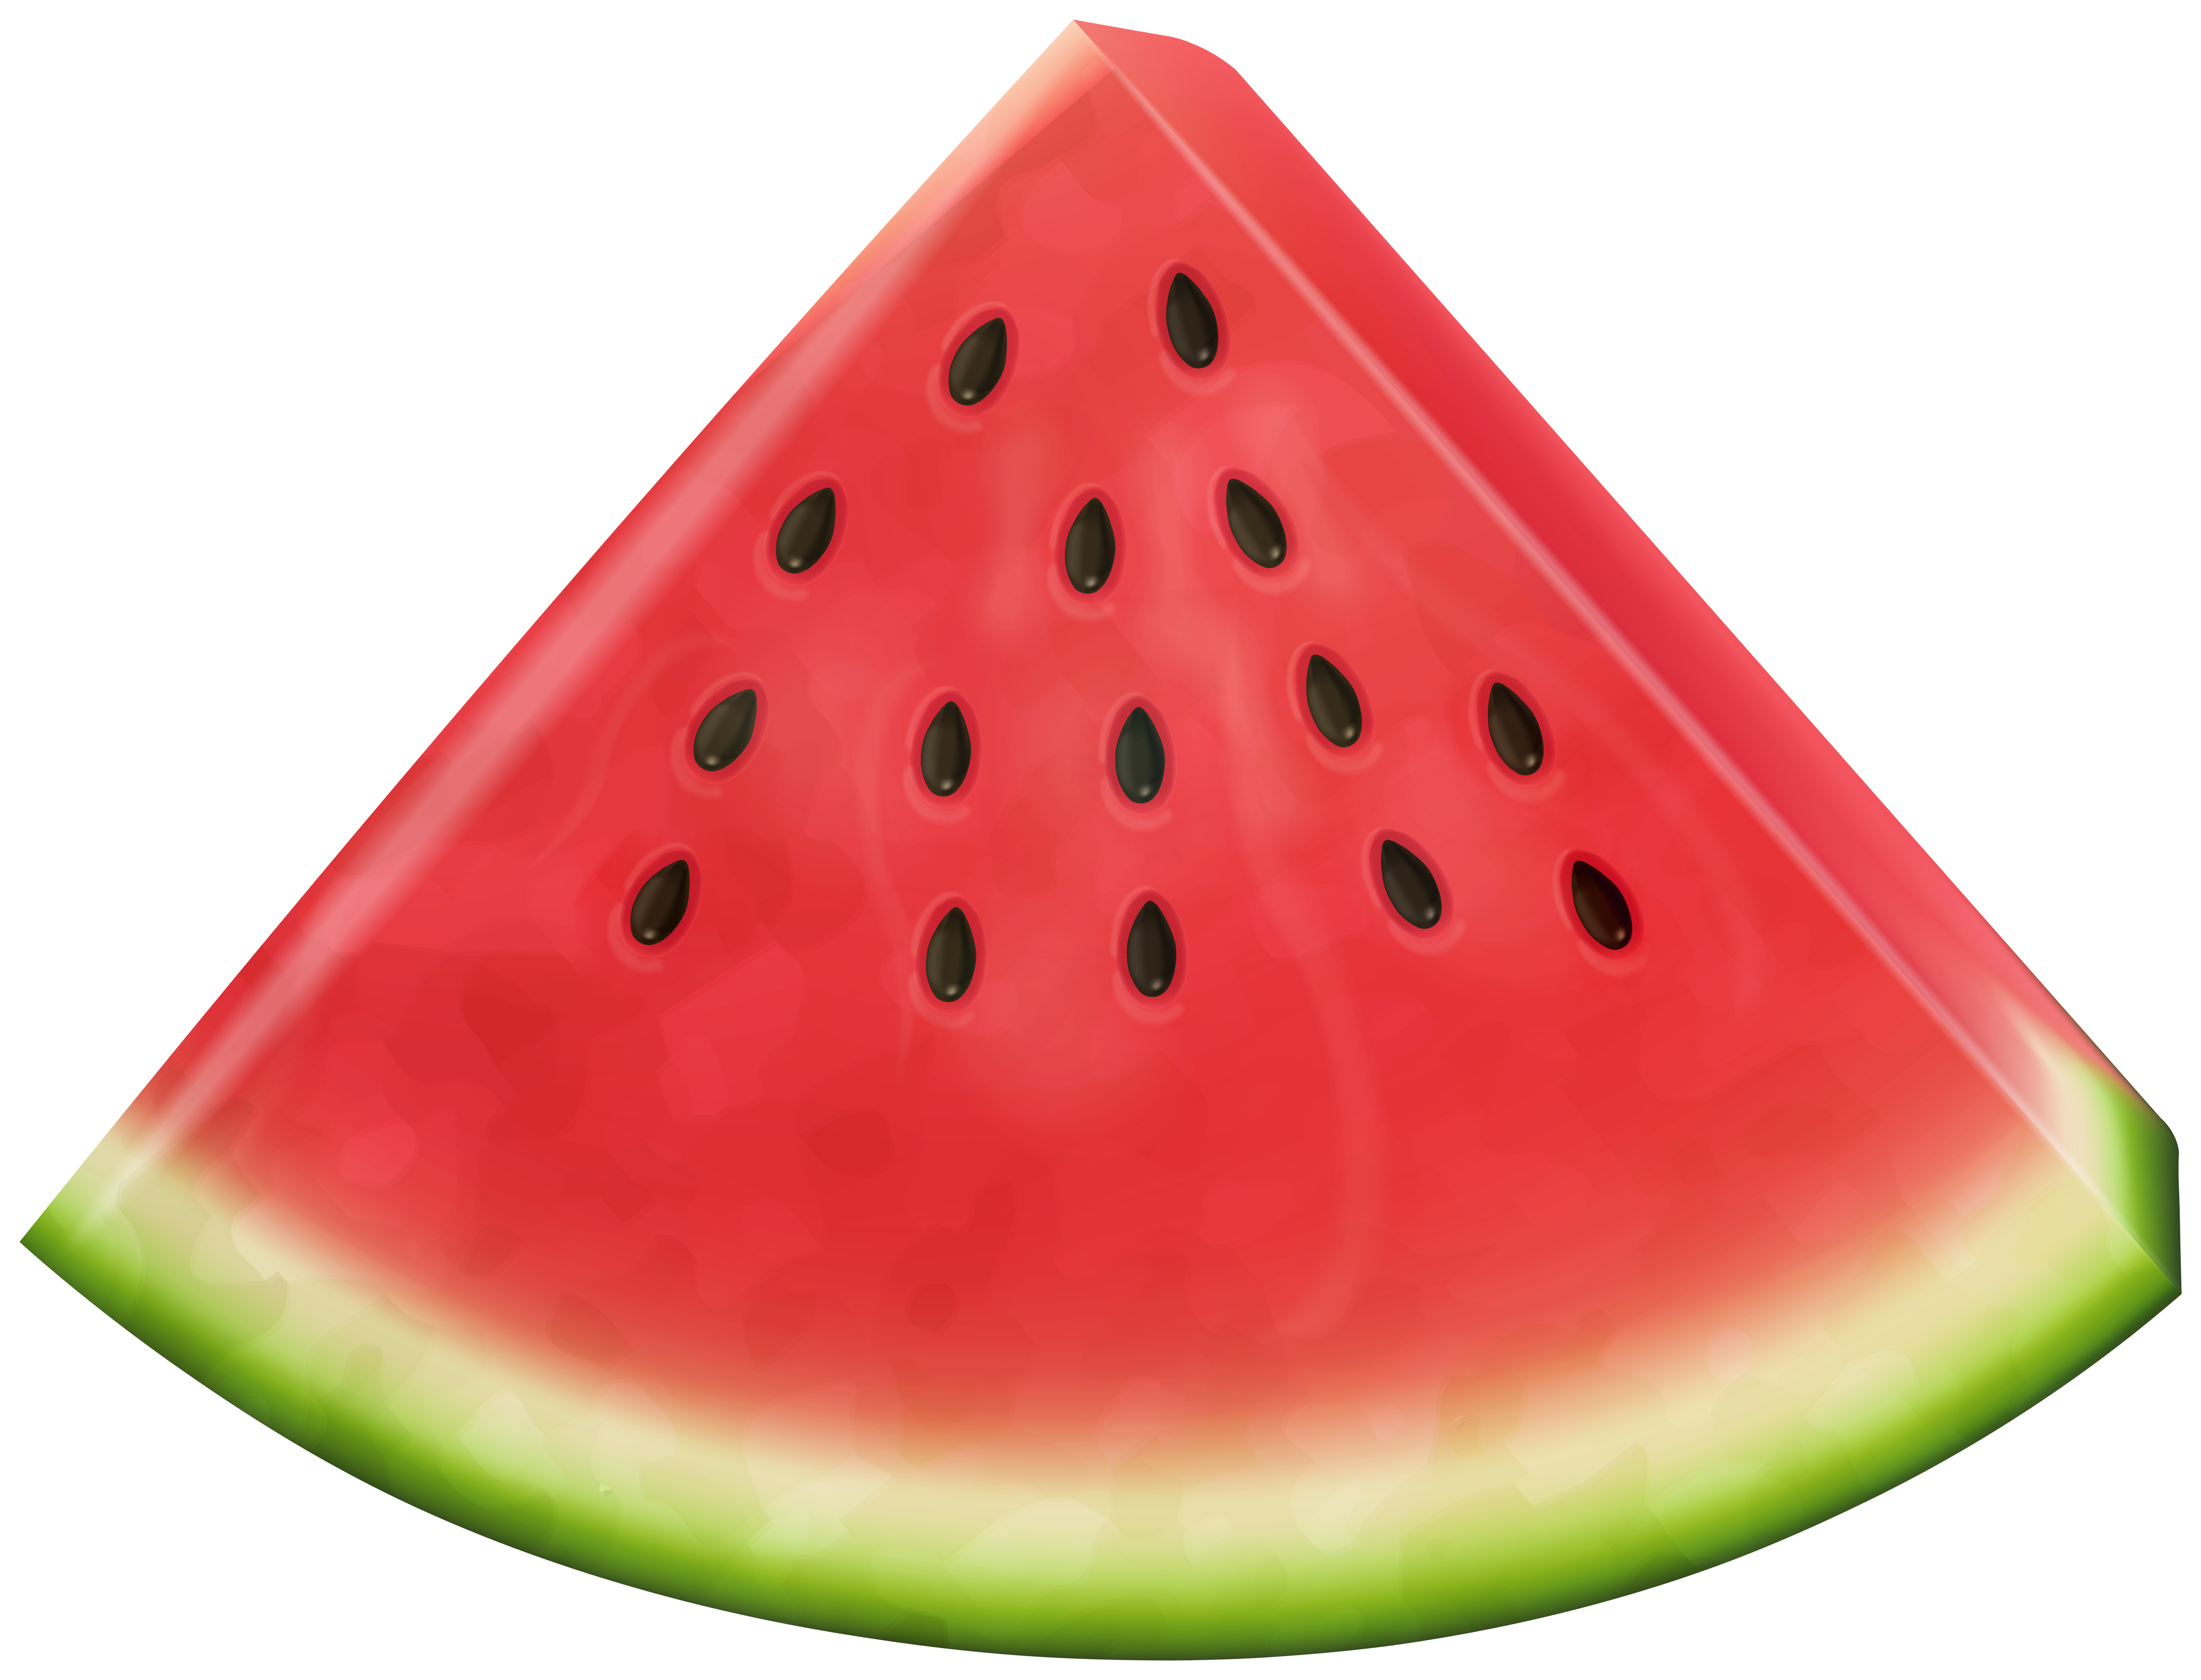 Watermelon clipart transparent background svg transparent stock Watermelon Clipart | Gallery Yopriceville - High-Quality ... svg transparent stock